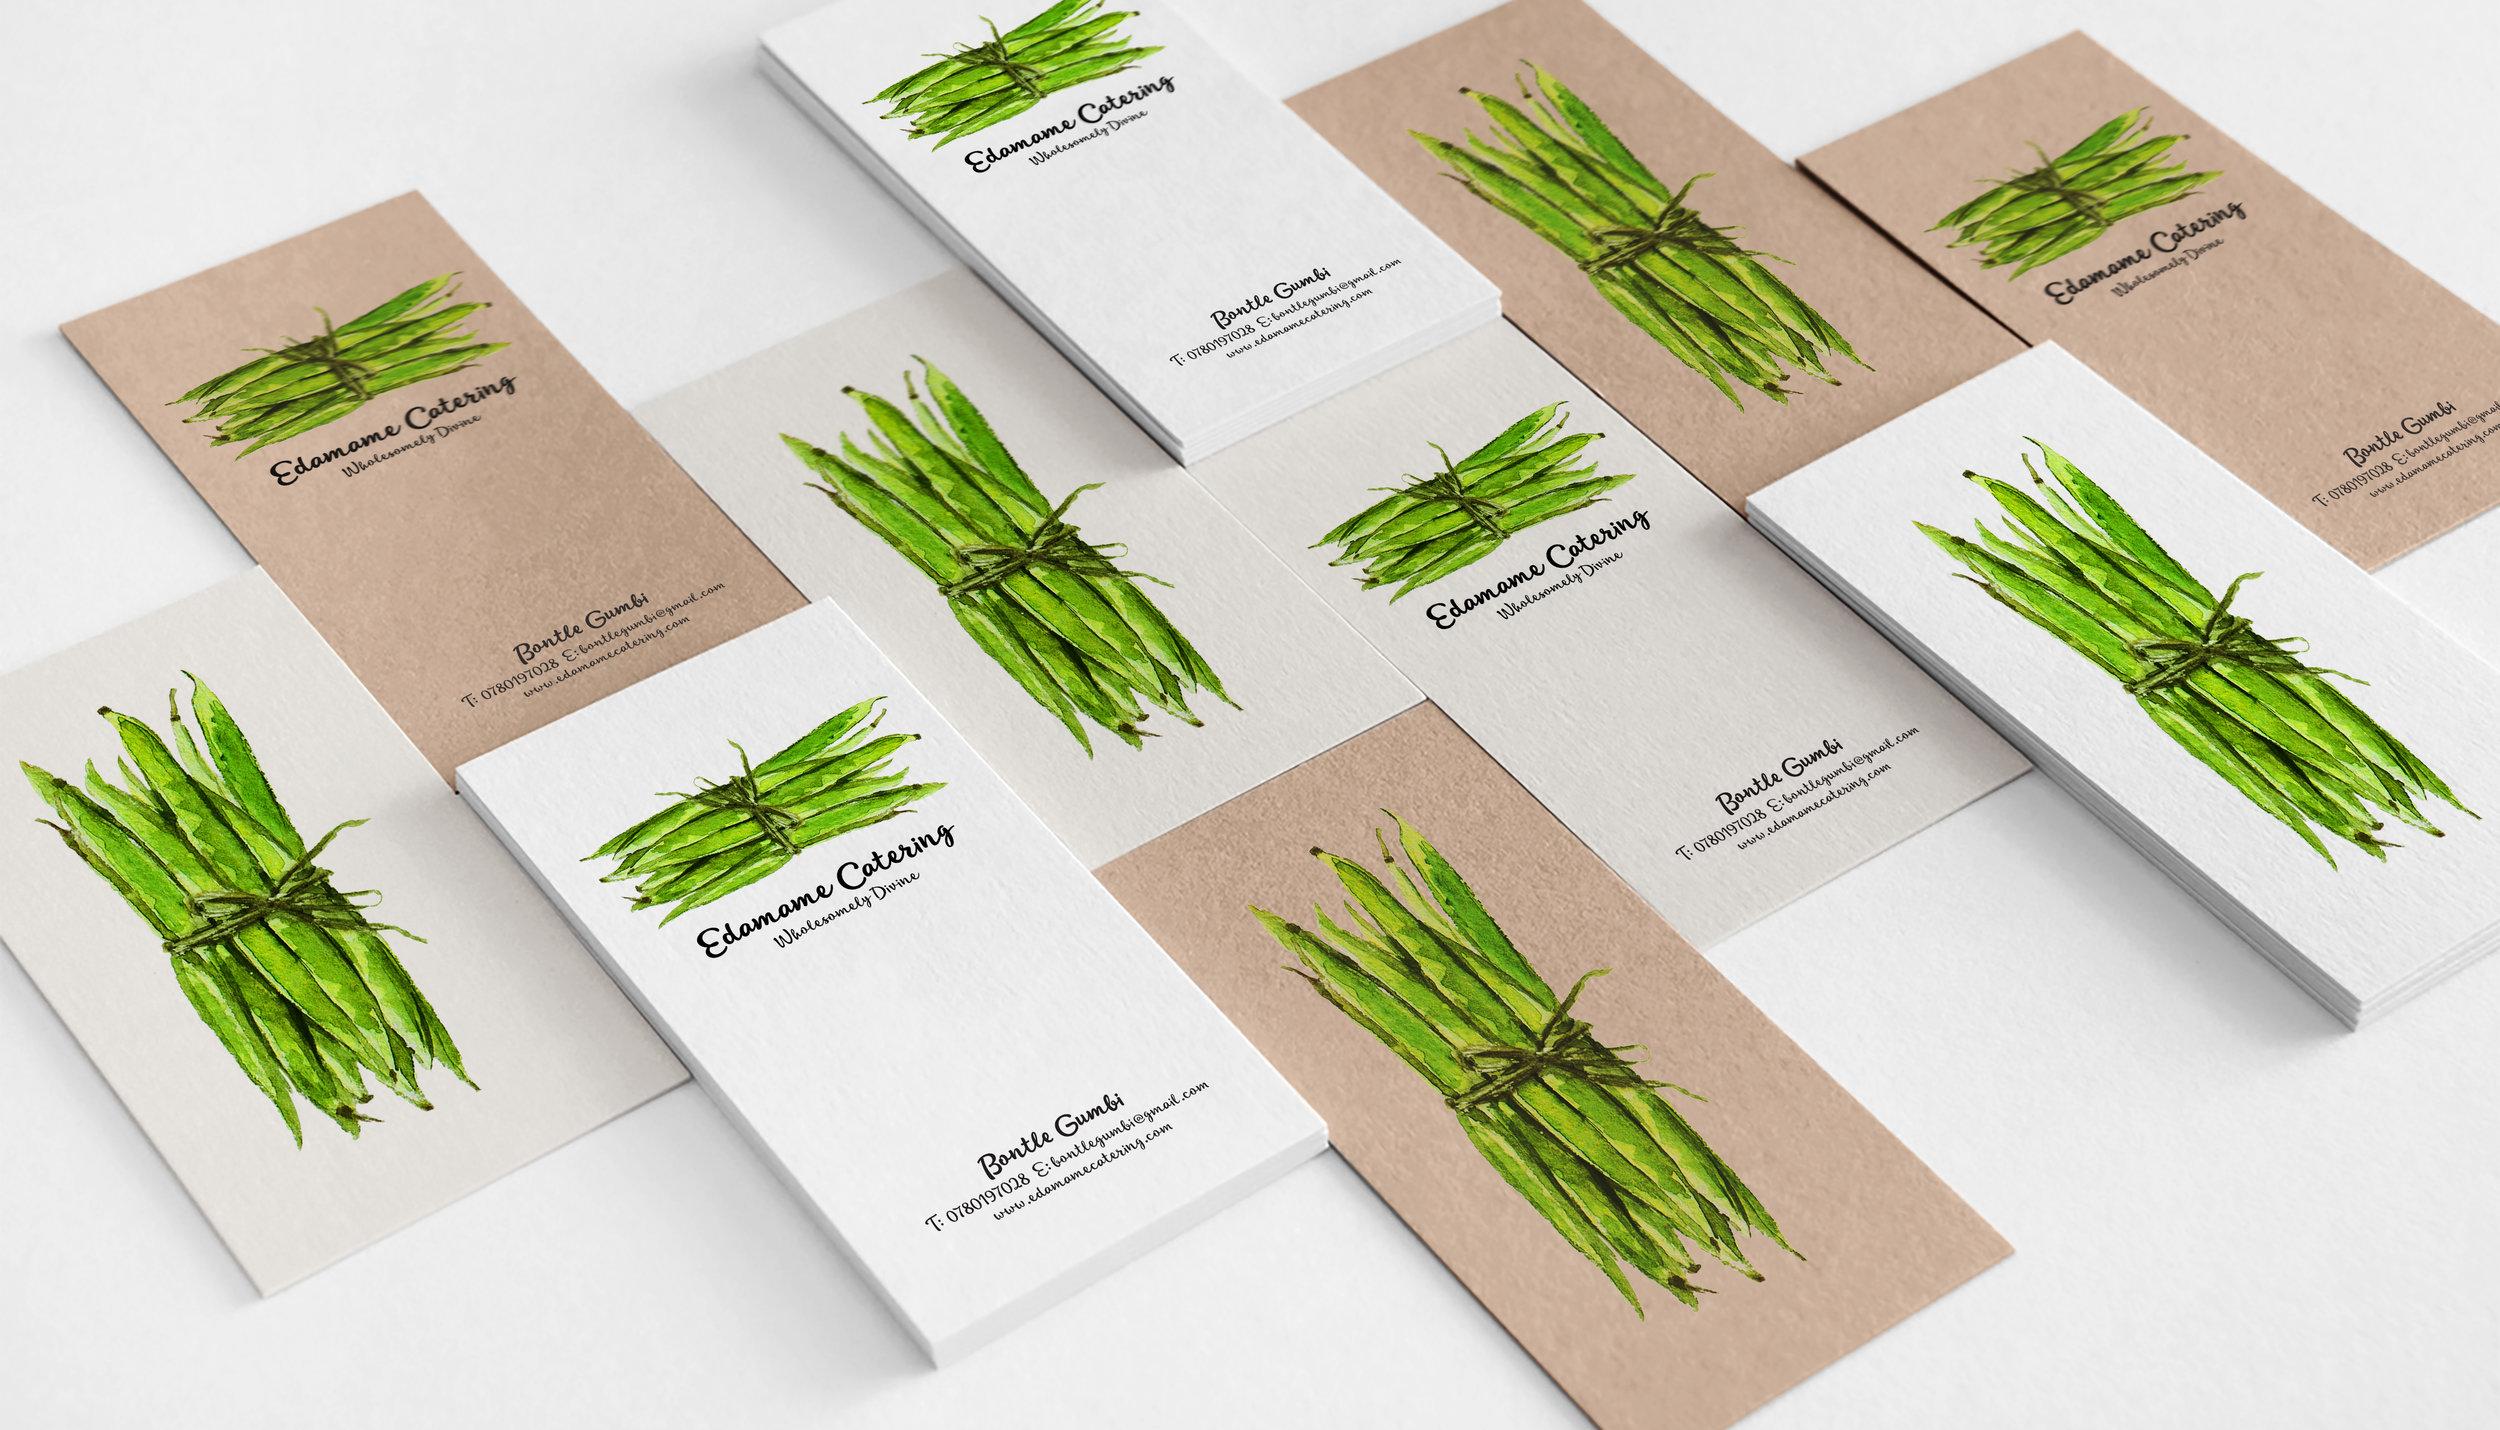 Edadame business cards HIGH RES - 02.jpg